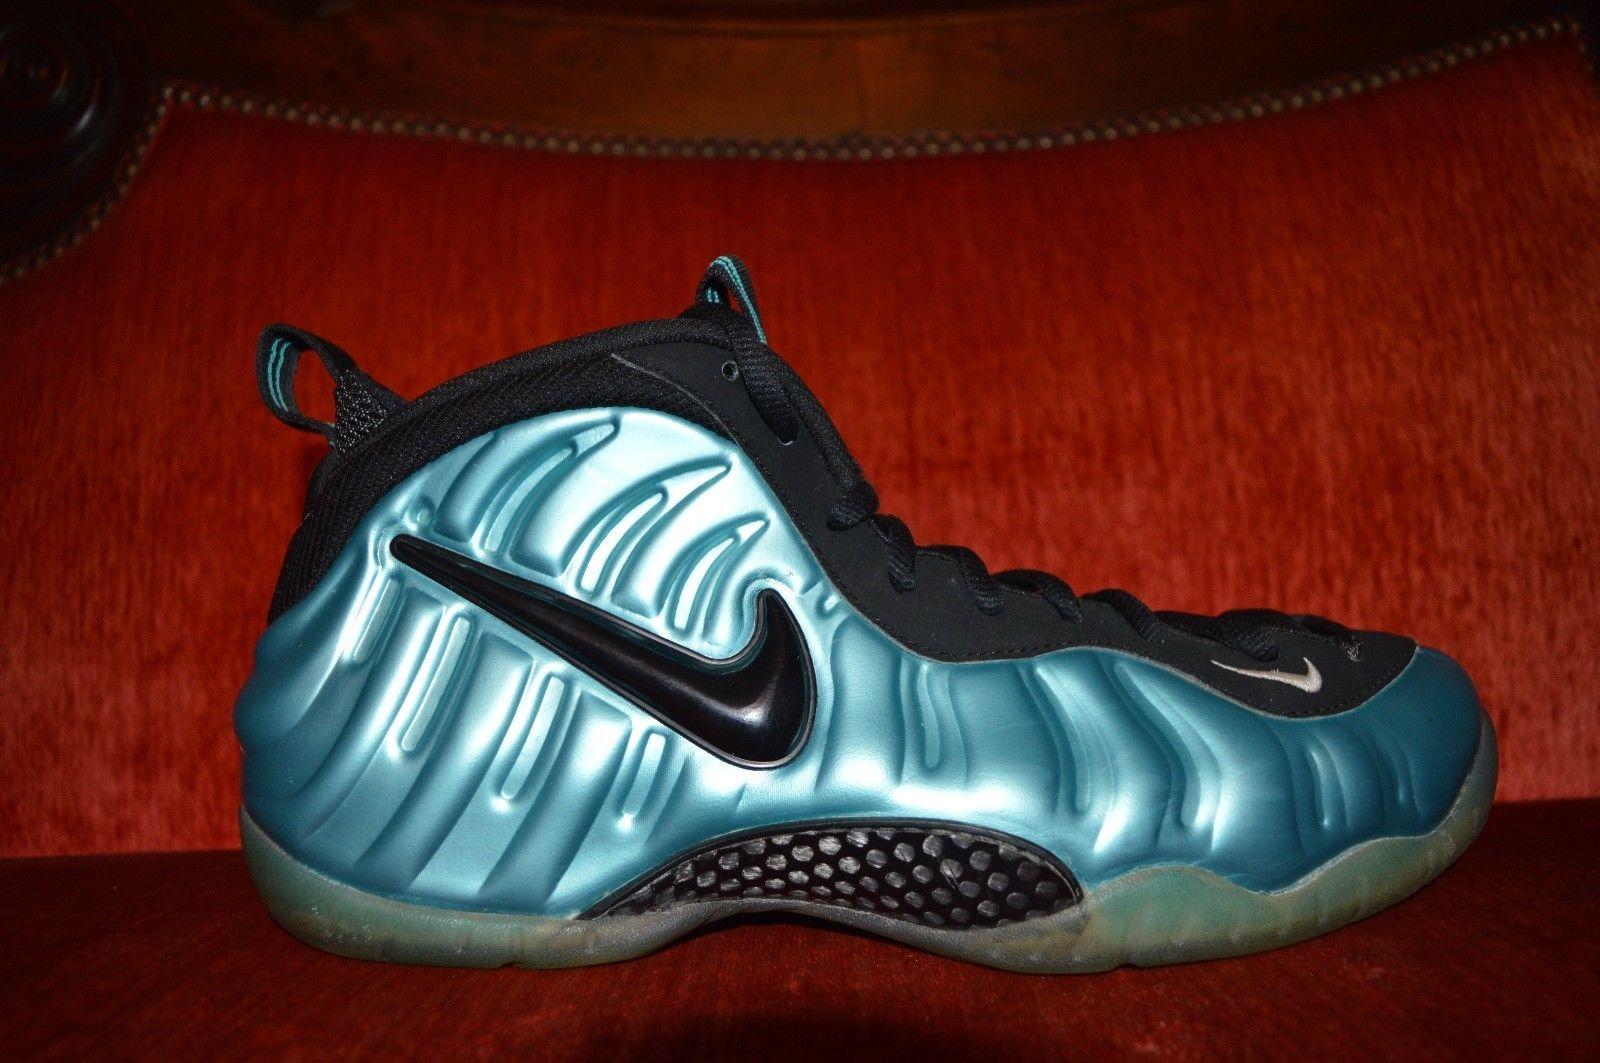 2011 Nike Air Foamposite PRO Electric Blue (624041-410) Men's Size 12